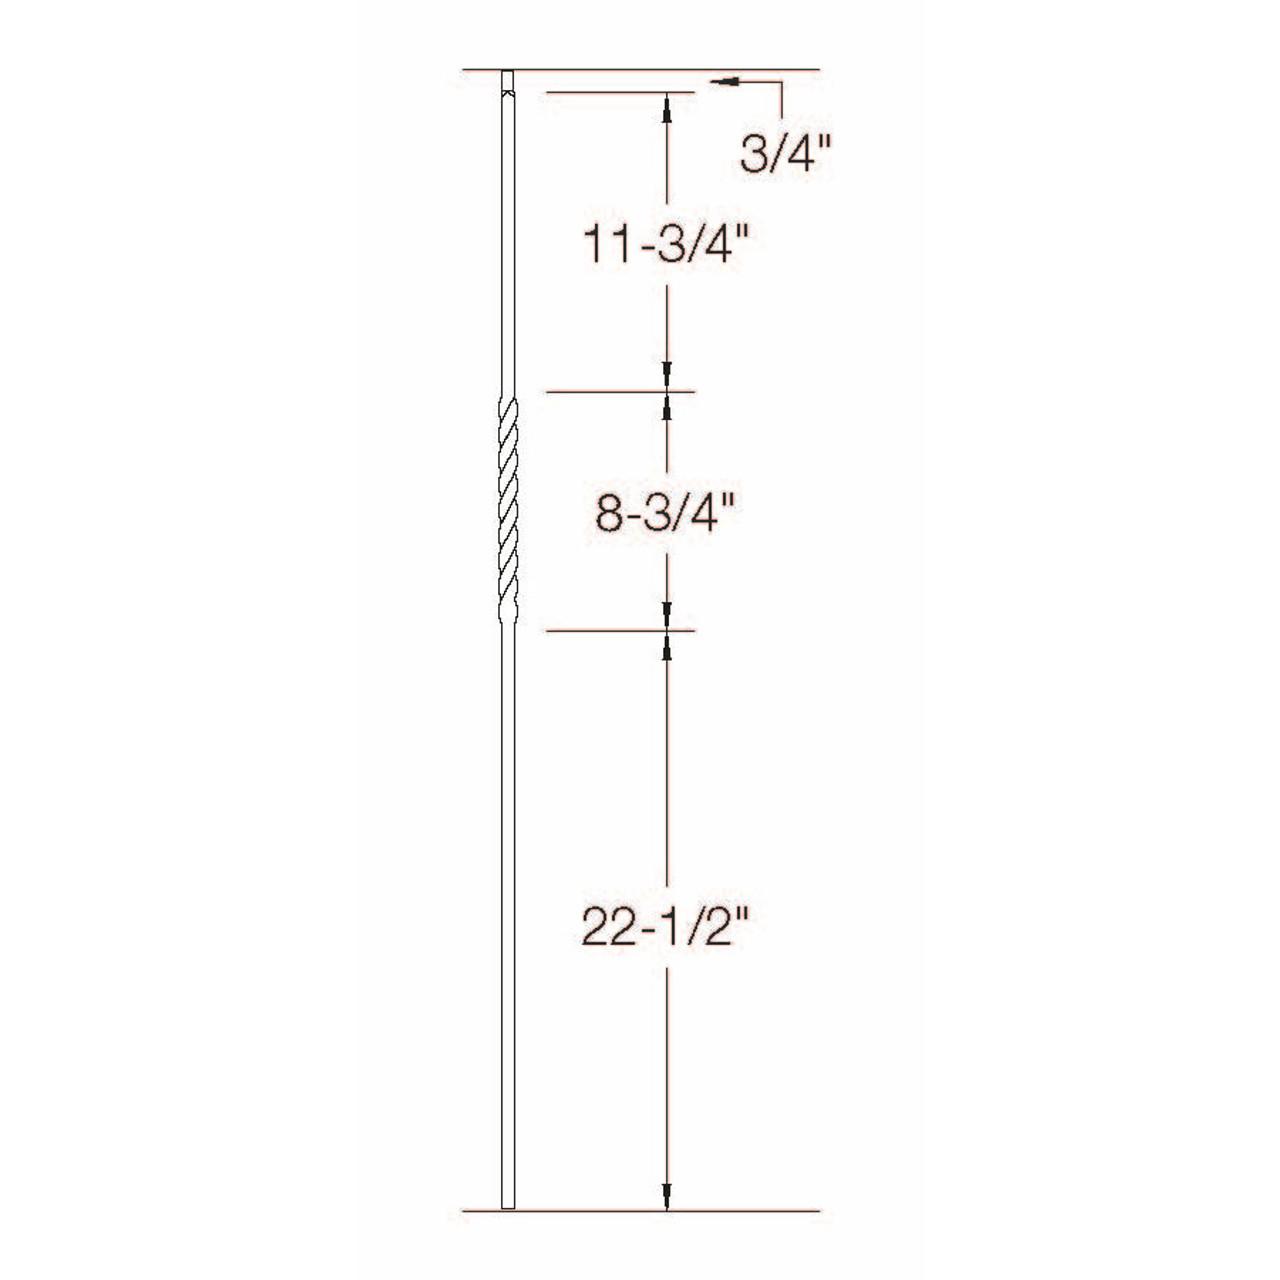 T-02 Single Twist, Tubular Steel Dimensional Information